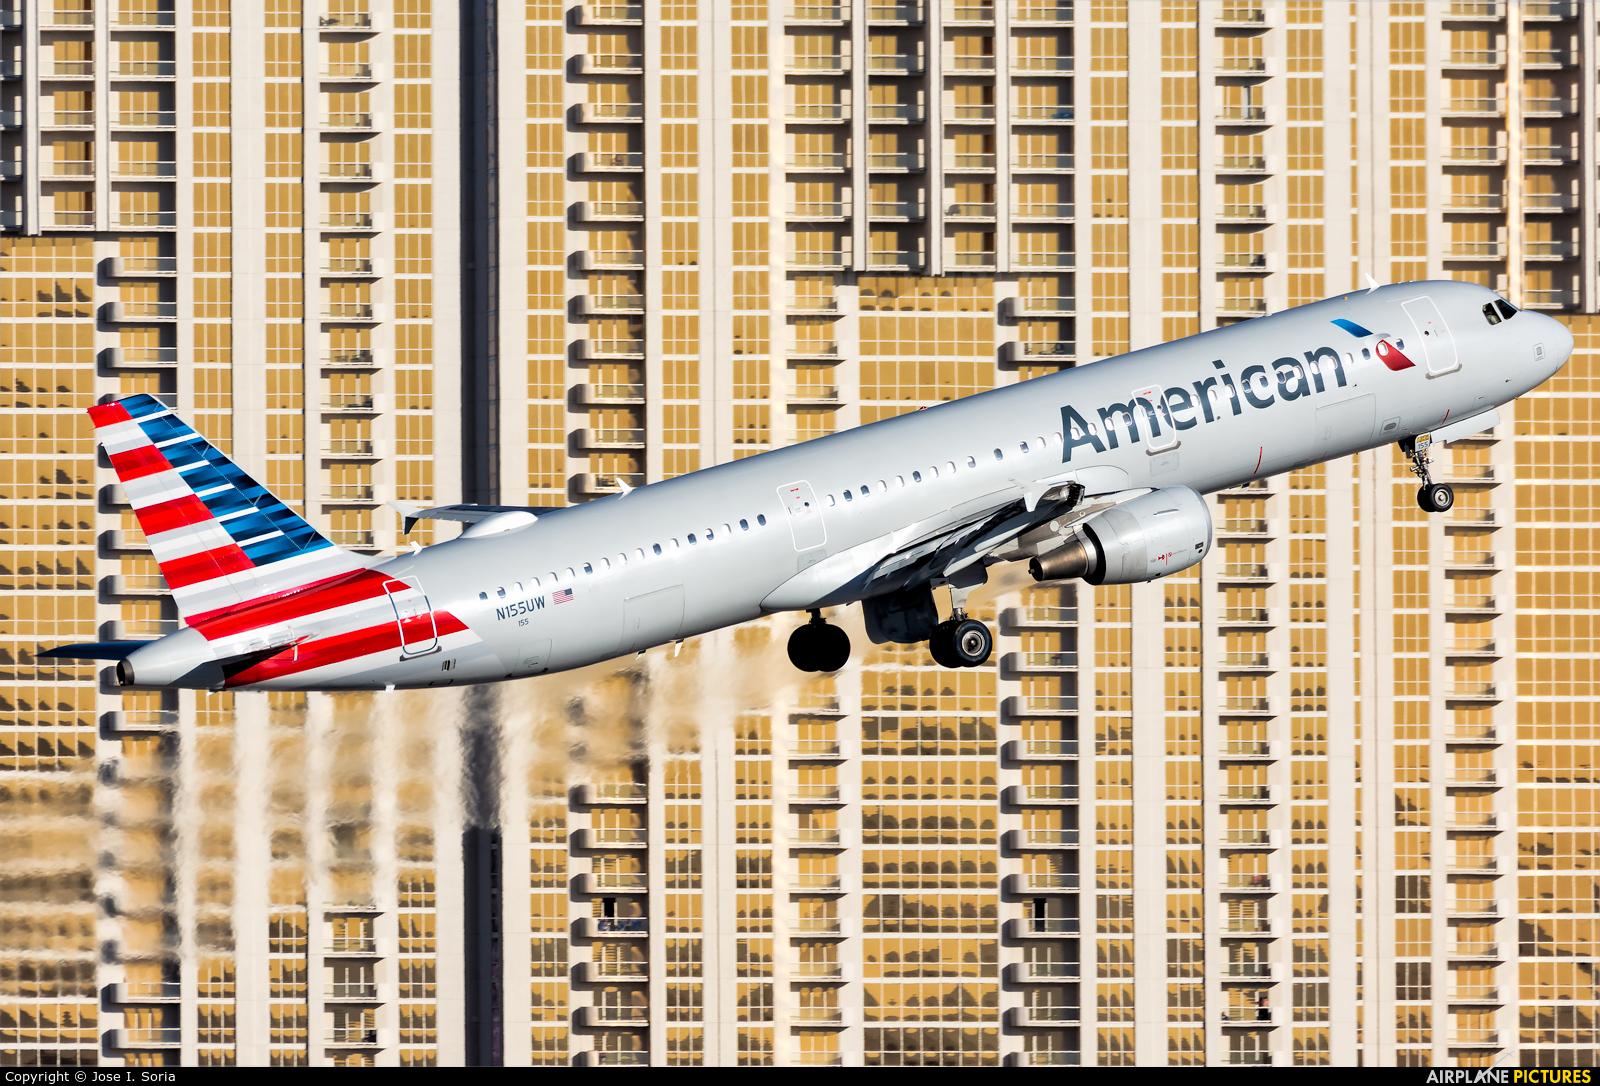 American Airlines N155UW aircraft at Las Vegas - McCarran Intl